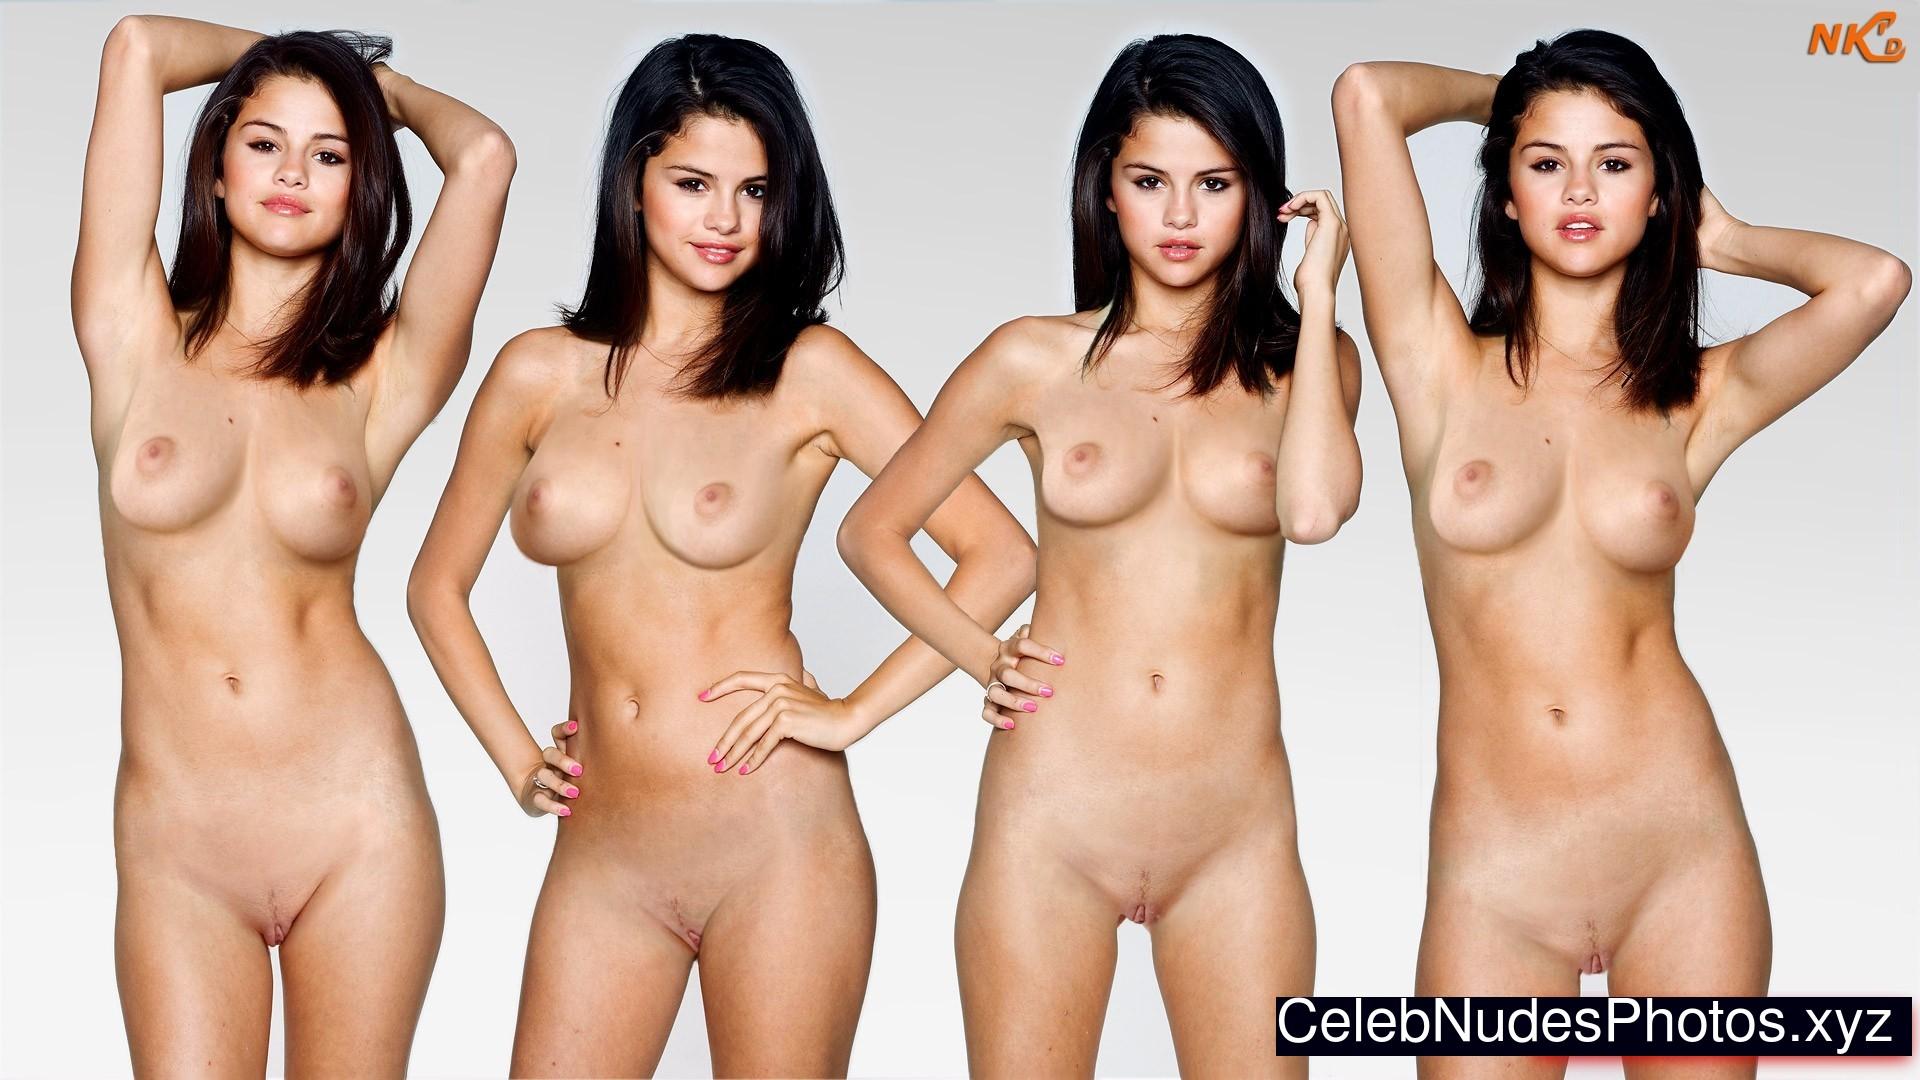 selena gomez real naked pic